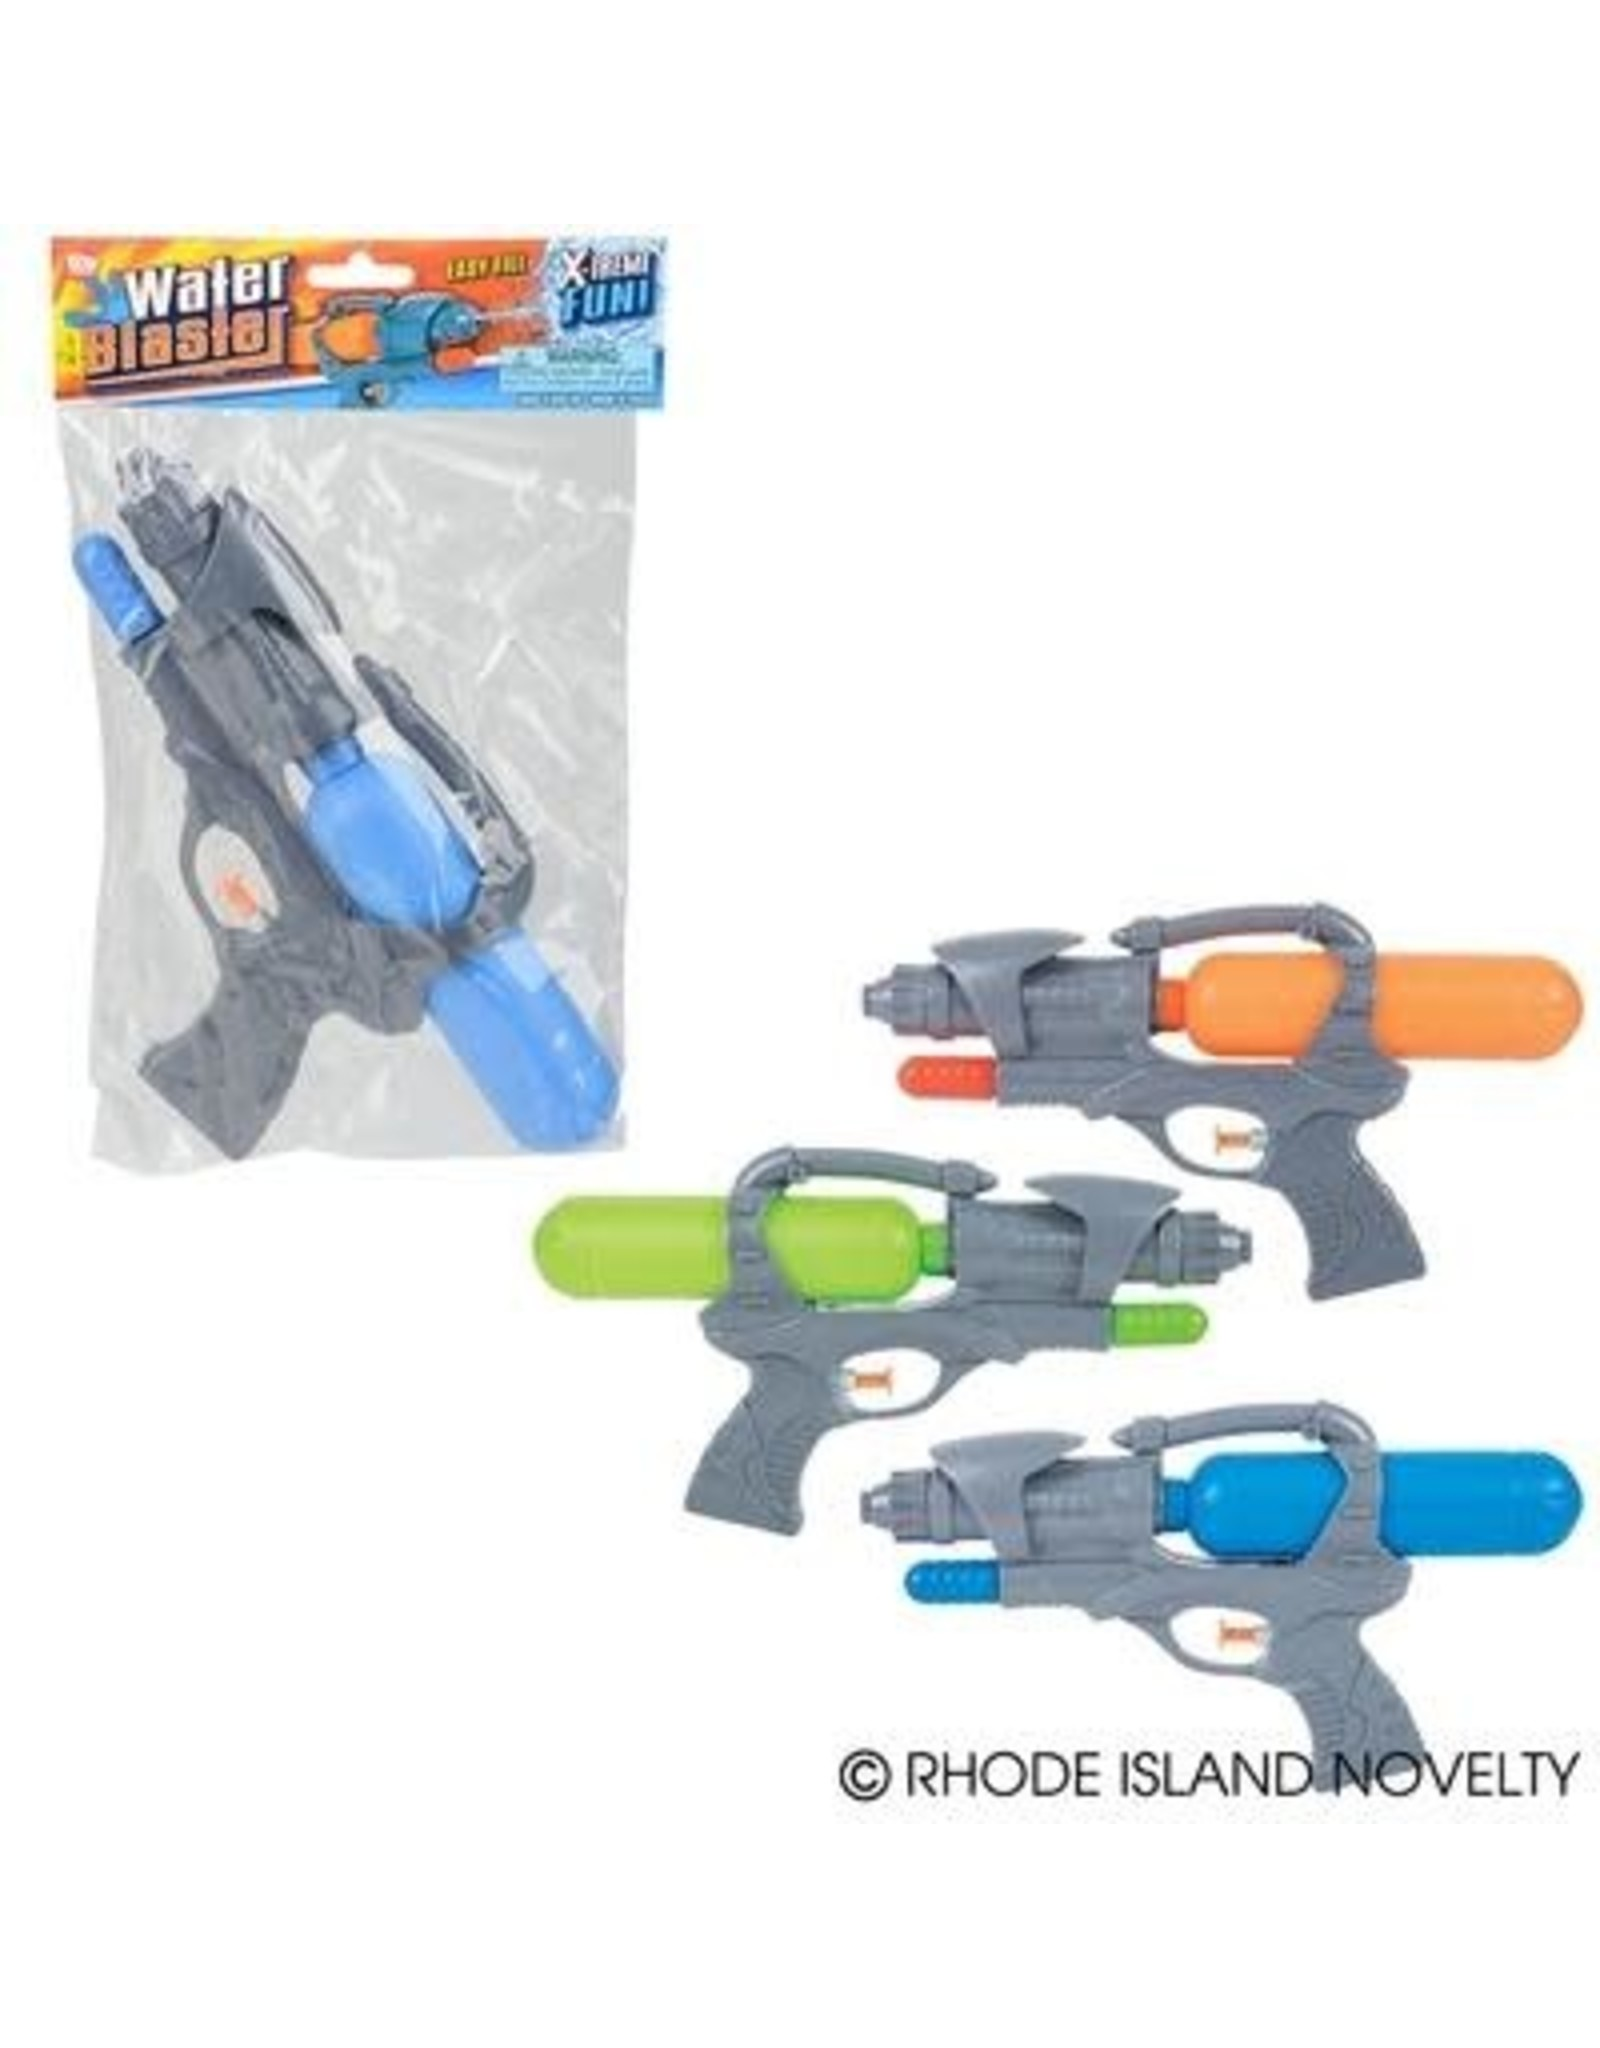 "RHODE ISLAND NOVELTY 10"" Water Blaster"